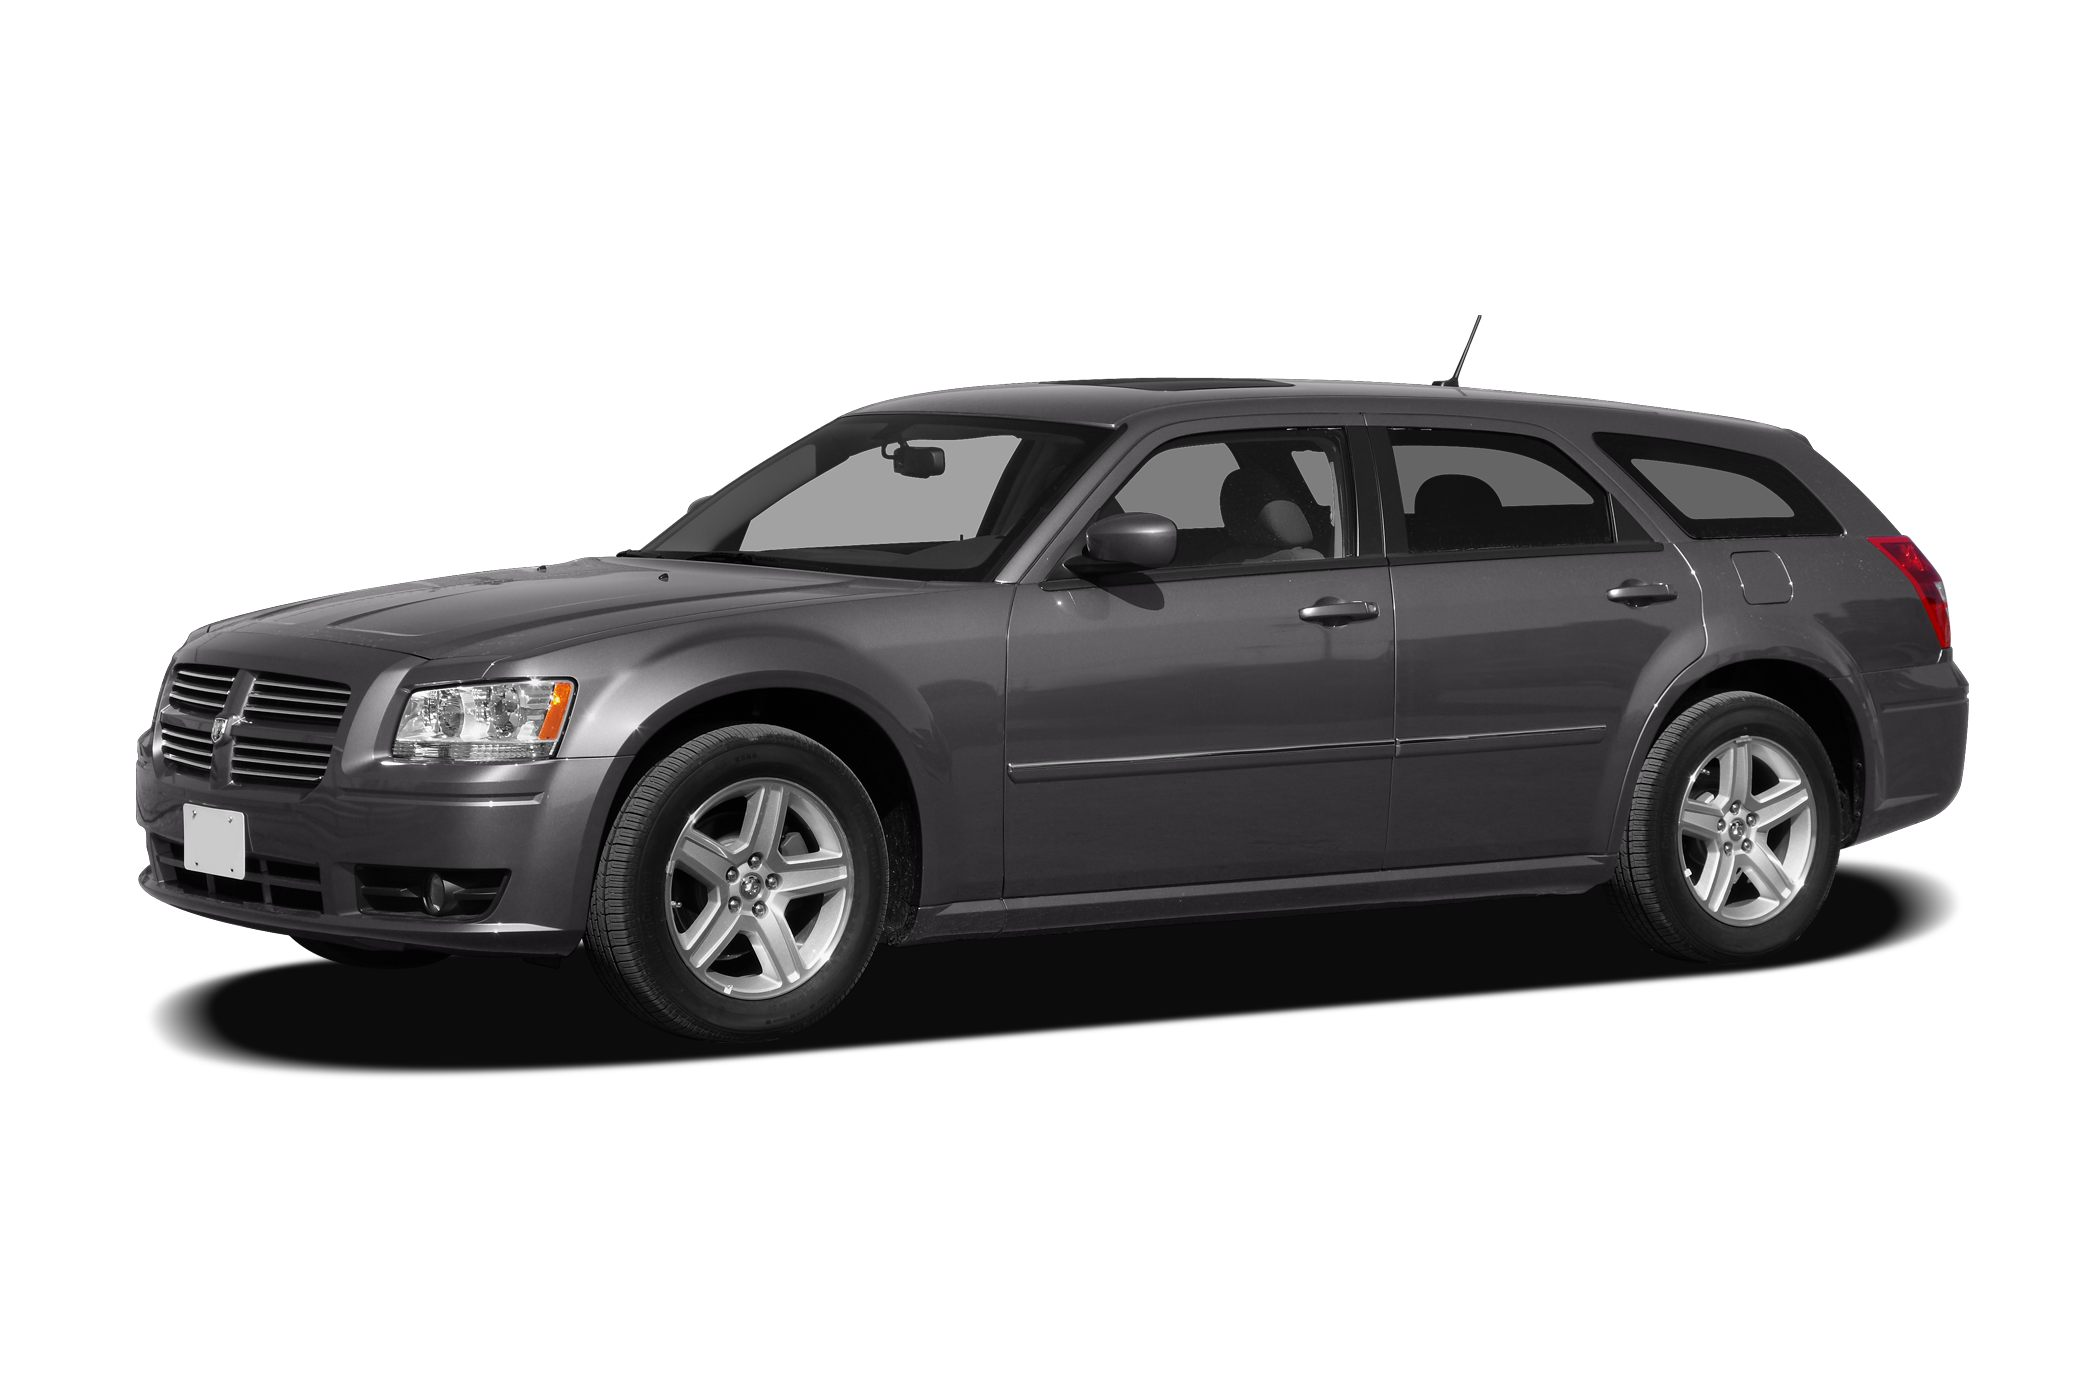 [SODI_2457]   2008 Dodge Magnum SXT 4dr Rear-wheel Drive Wagon Specs and Prices | Dodge Magnum Se Engine Diagram |  | Autoblog